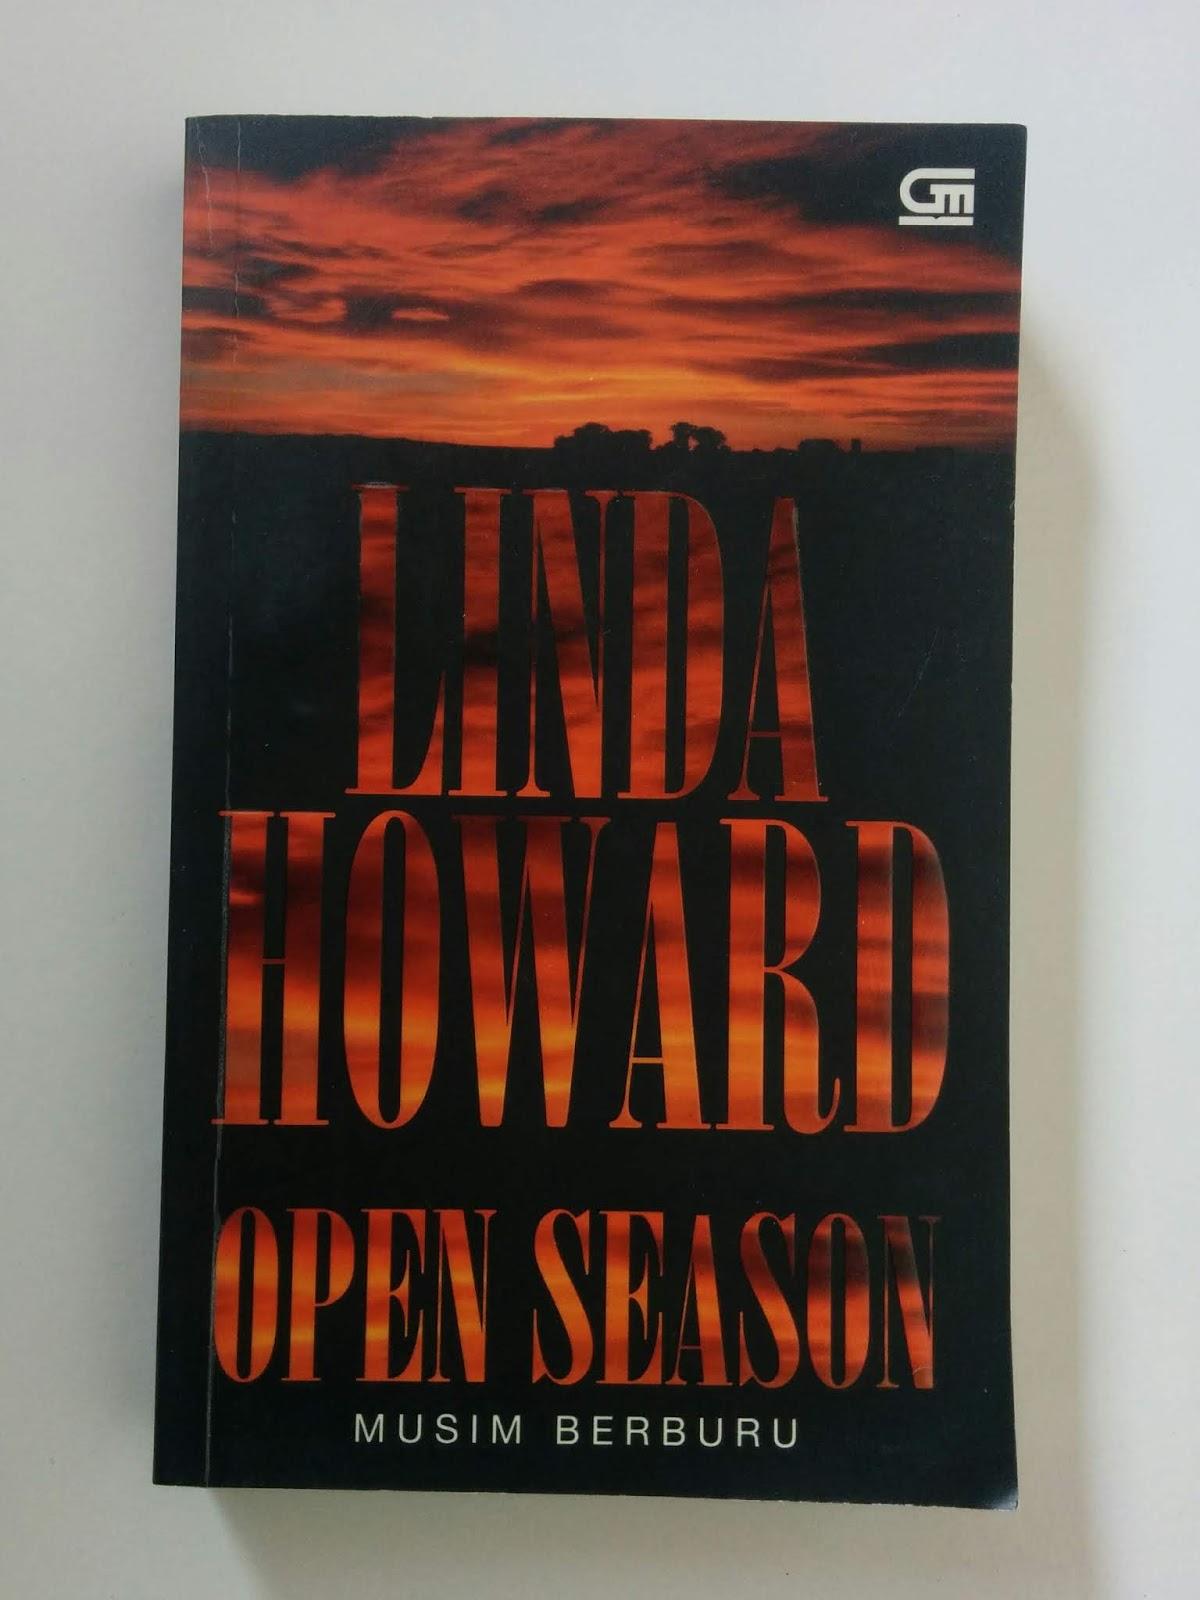 Novel Bekas Open Season (Musim Berburu)